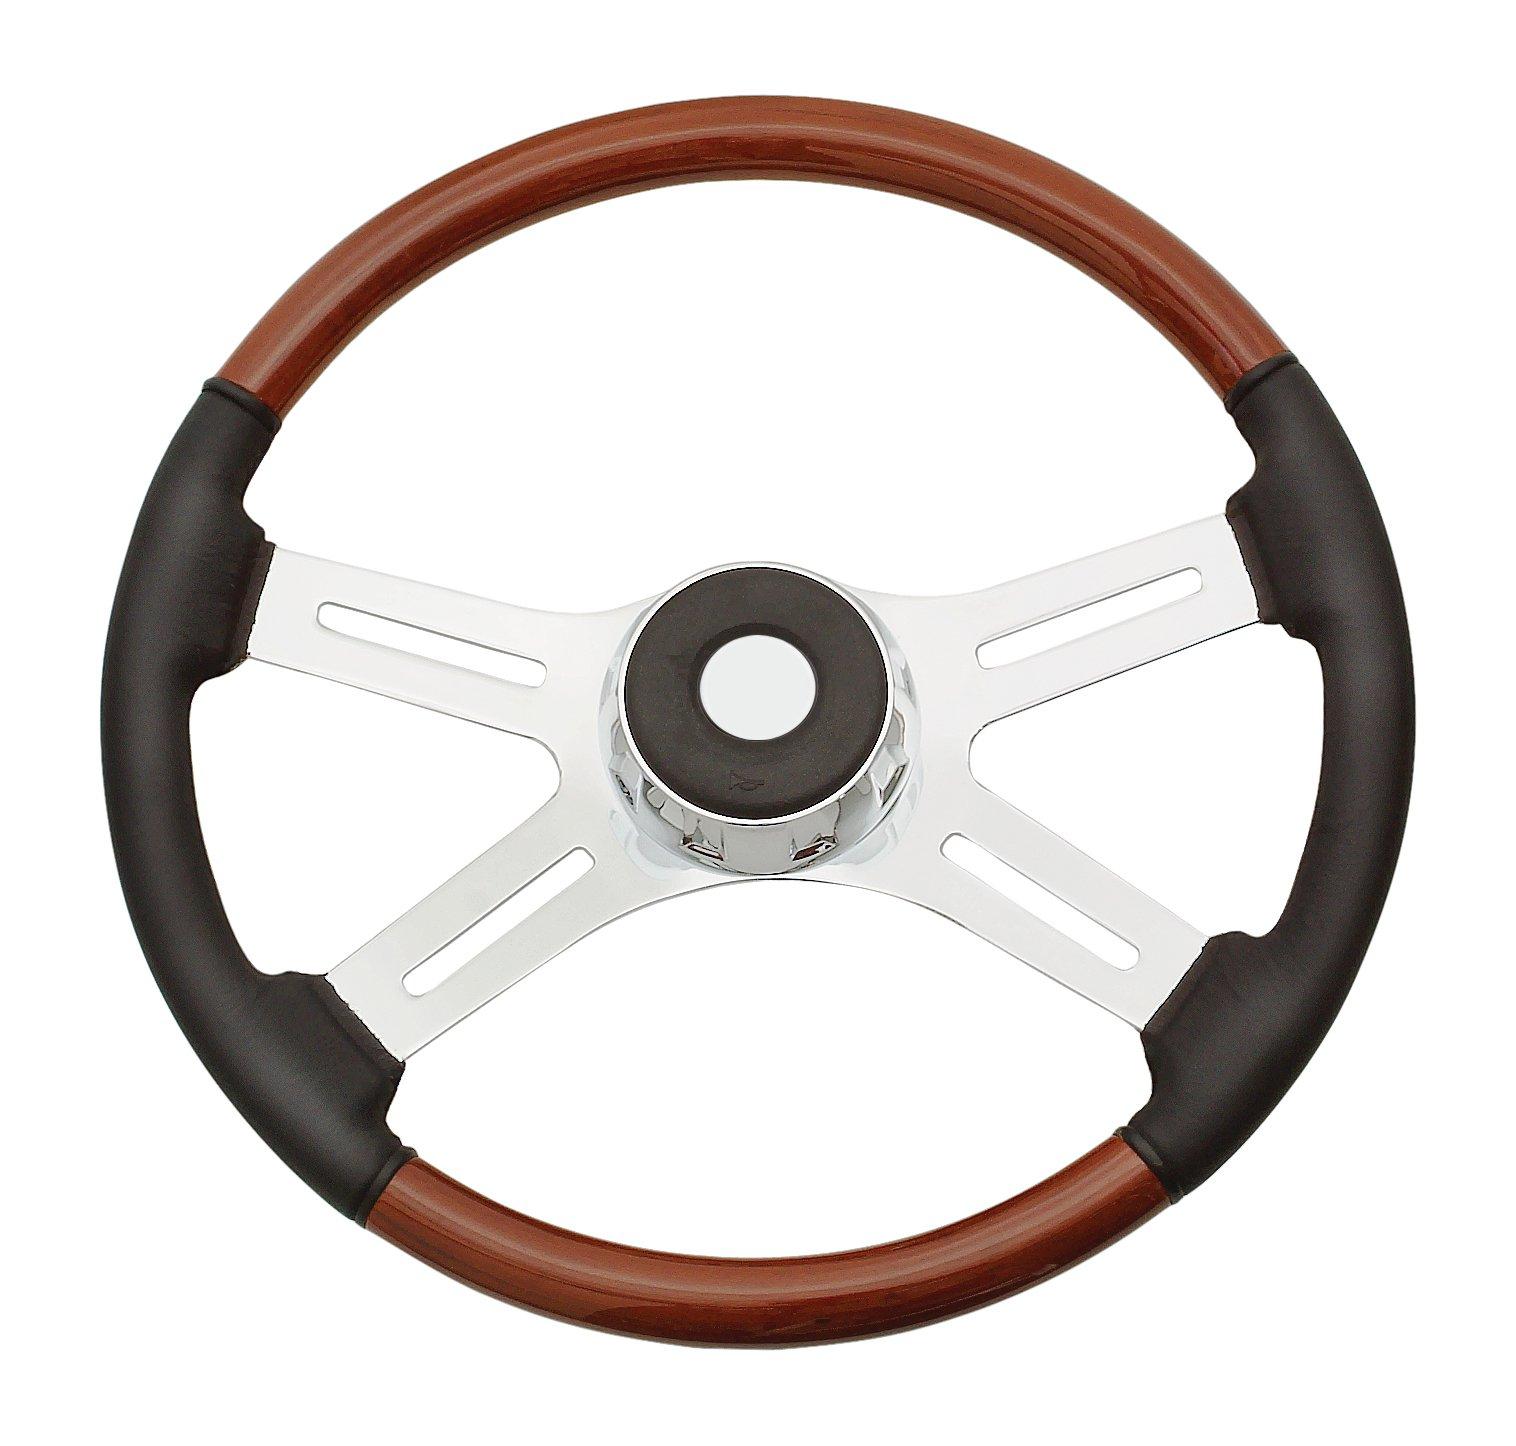 Woody's WP-SWPBL Rosewood Chrome Truck Steering Wheel (Beautiful African Hardwood)